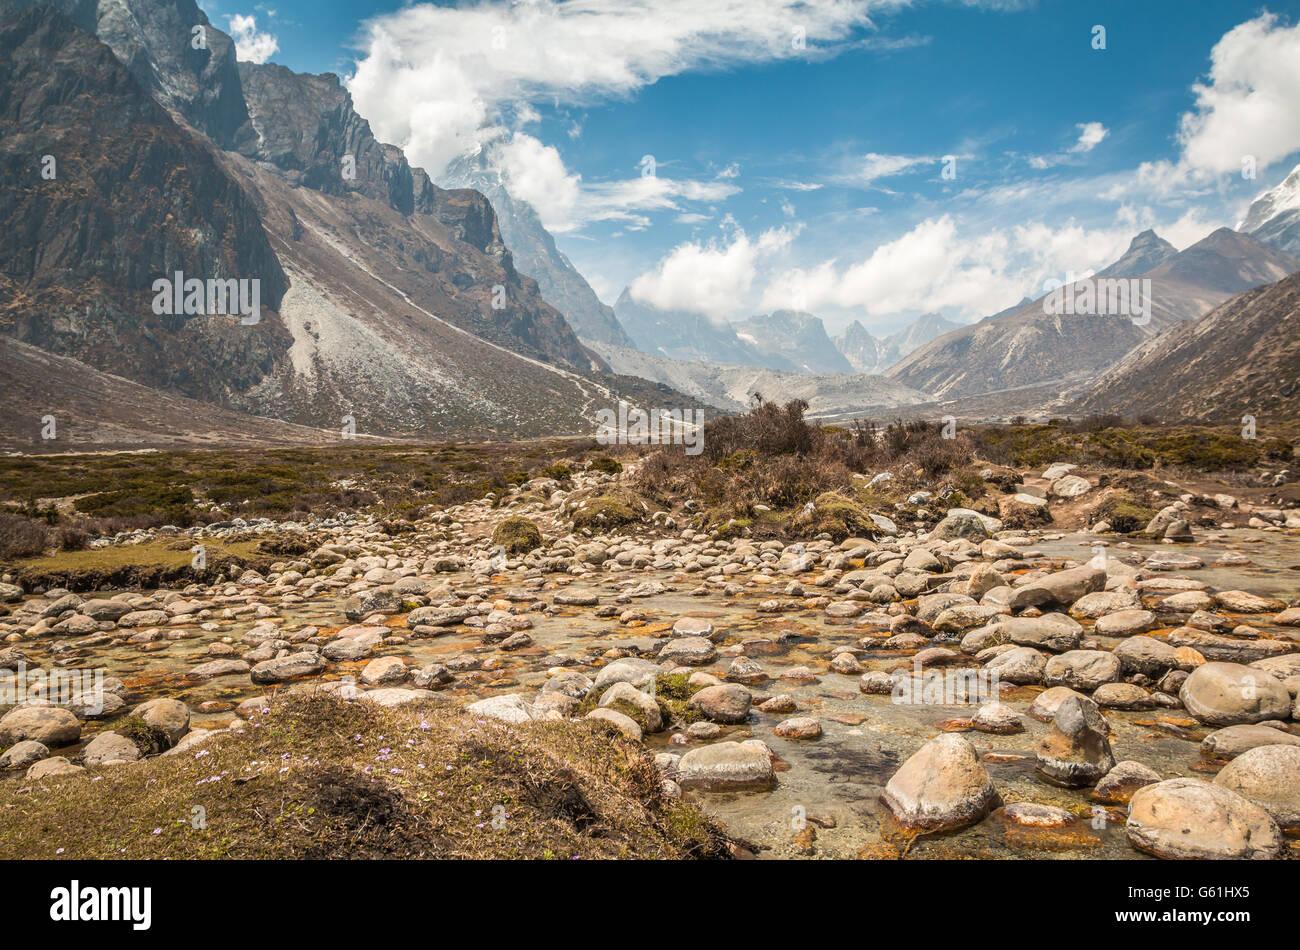 Mount everest base camp trek - Stock Image